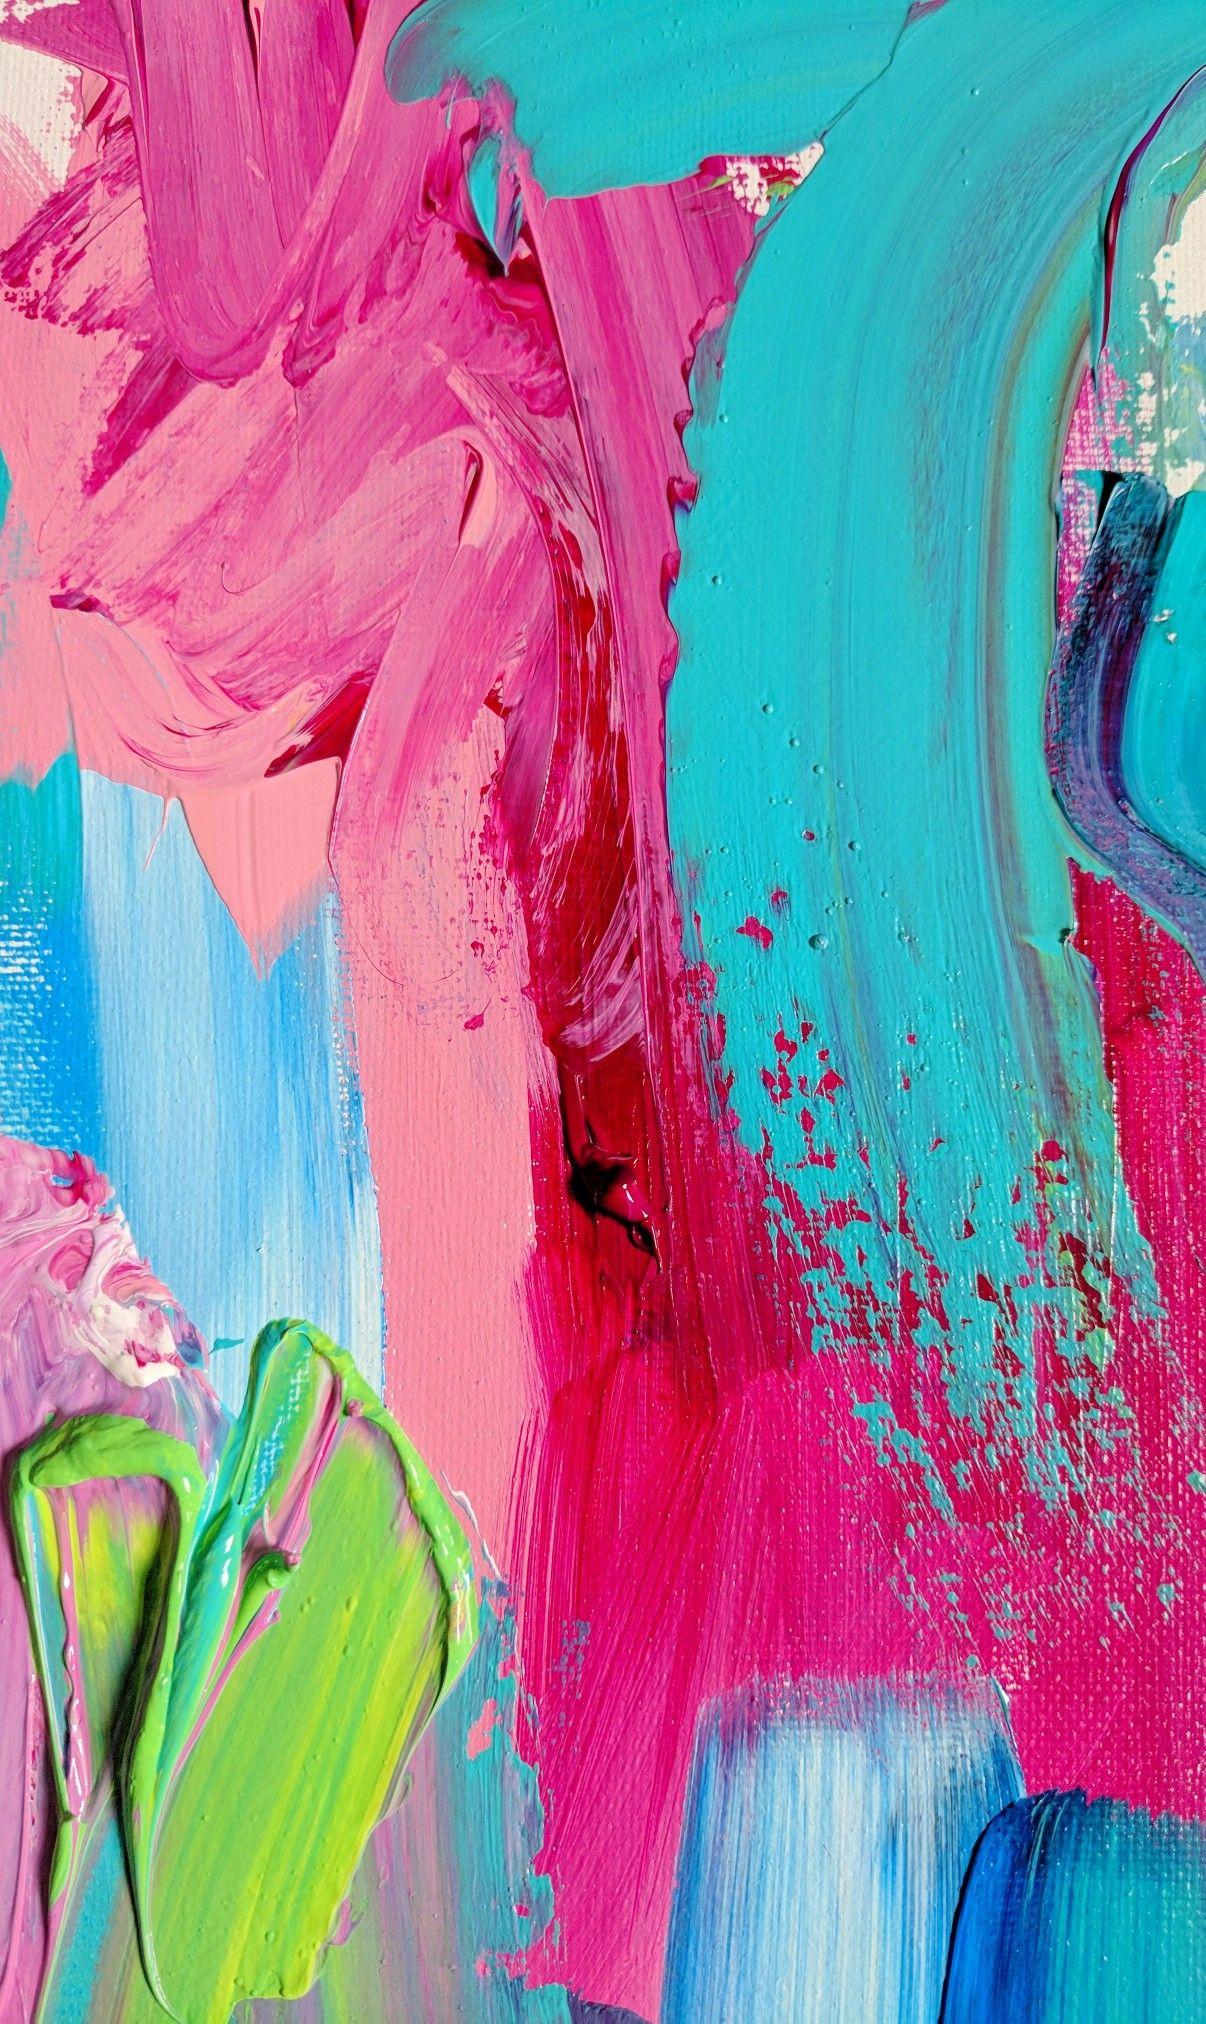 Sarah Coey Art Abstract Acrylic Painting Painting Wallpaper Abstract Art Painting Abstract Wallpaper